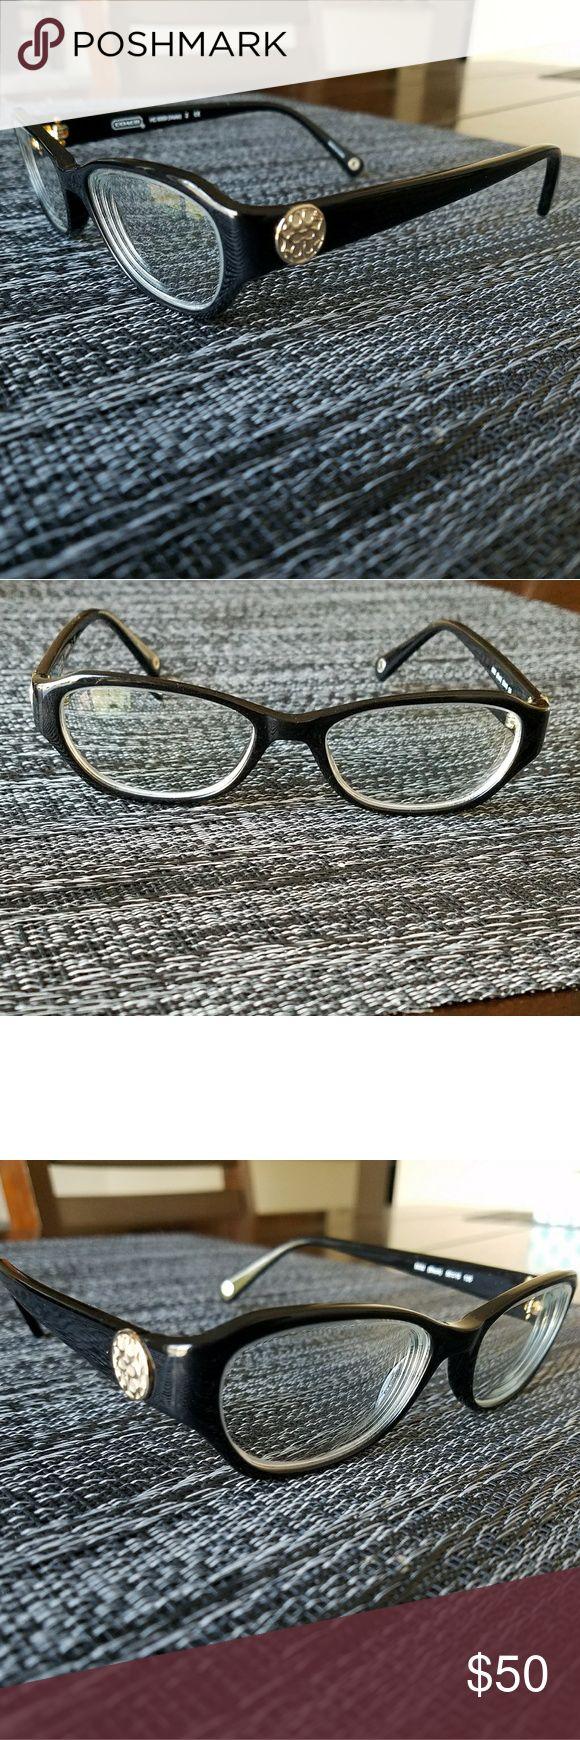 Coach Petite Eyeglass Frames : 25+ best ideas about Coach glasses frames on Pinterest ...